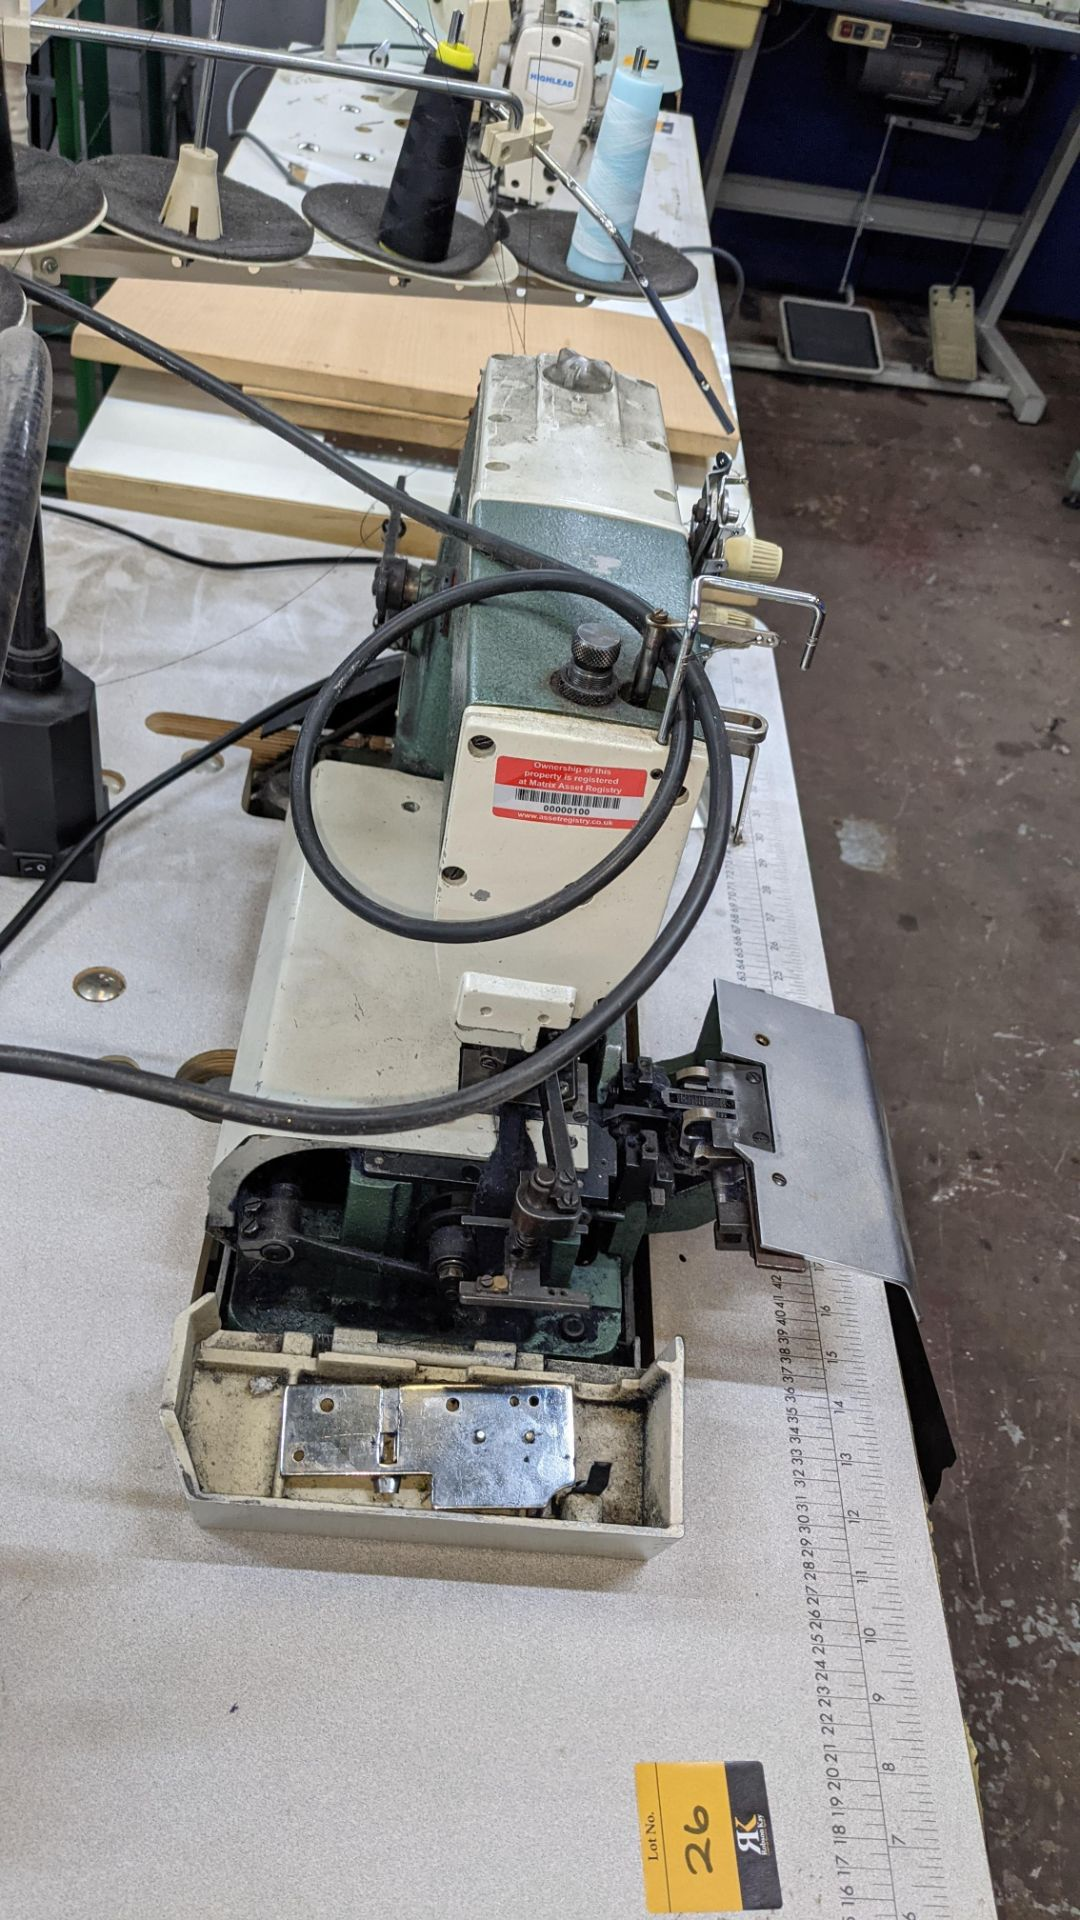 Sewing machine - Image 8 of 16